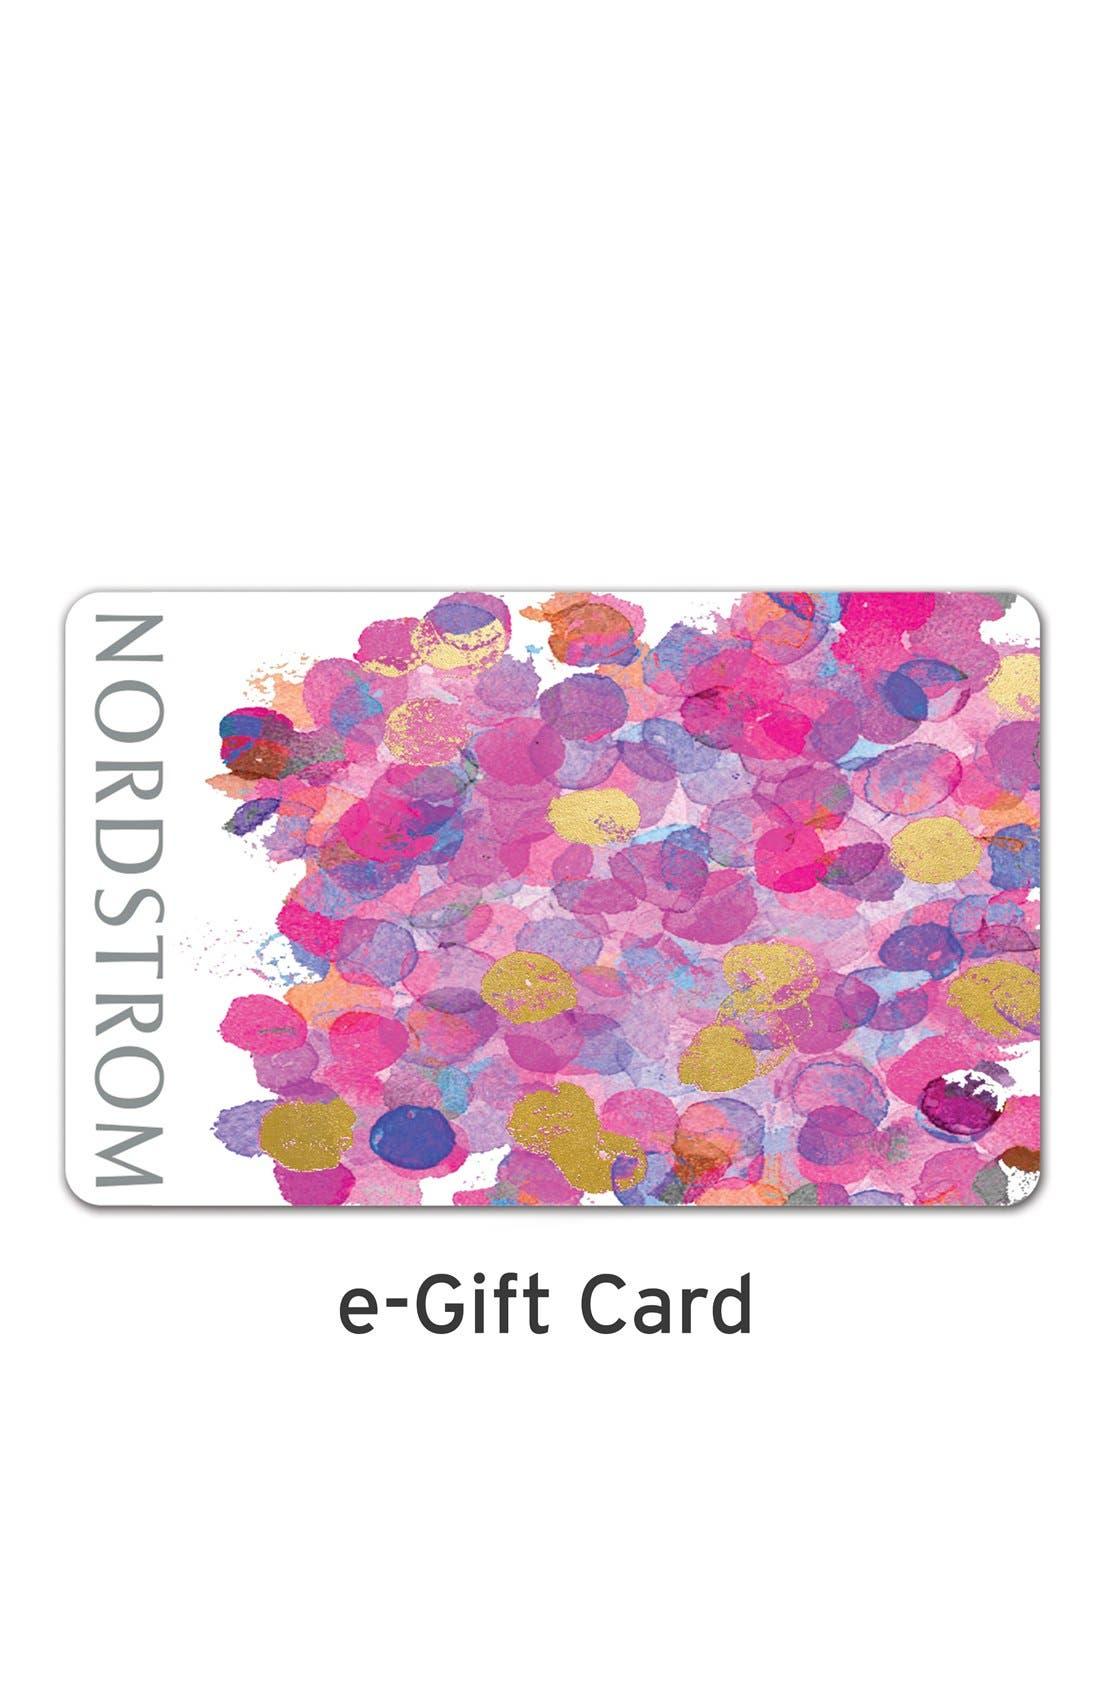 Nordstrom e-Gift Cards   Nordstrom